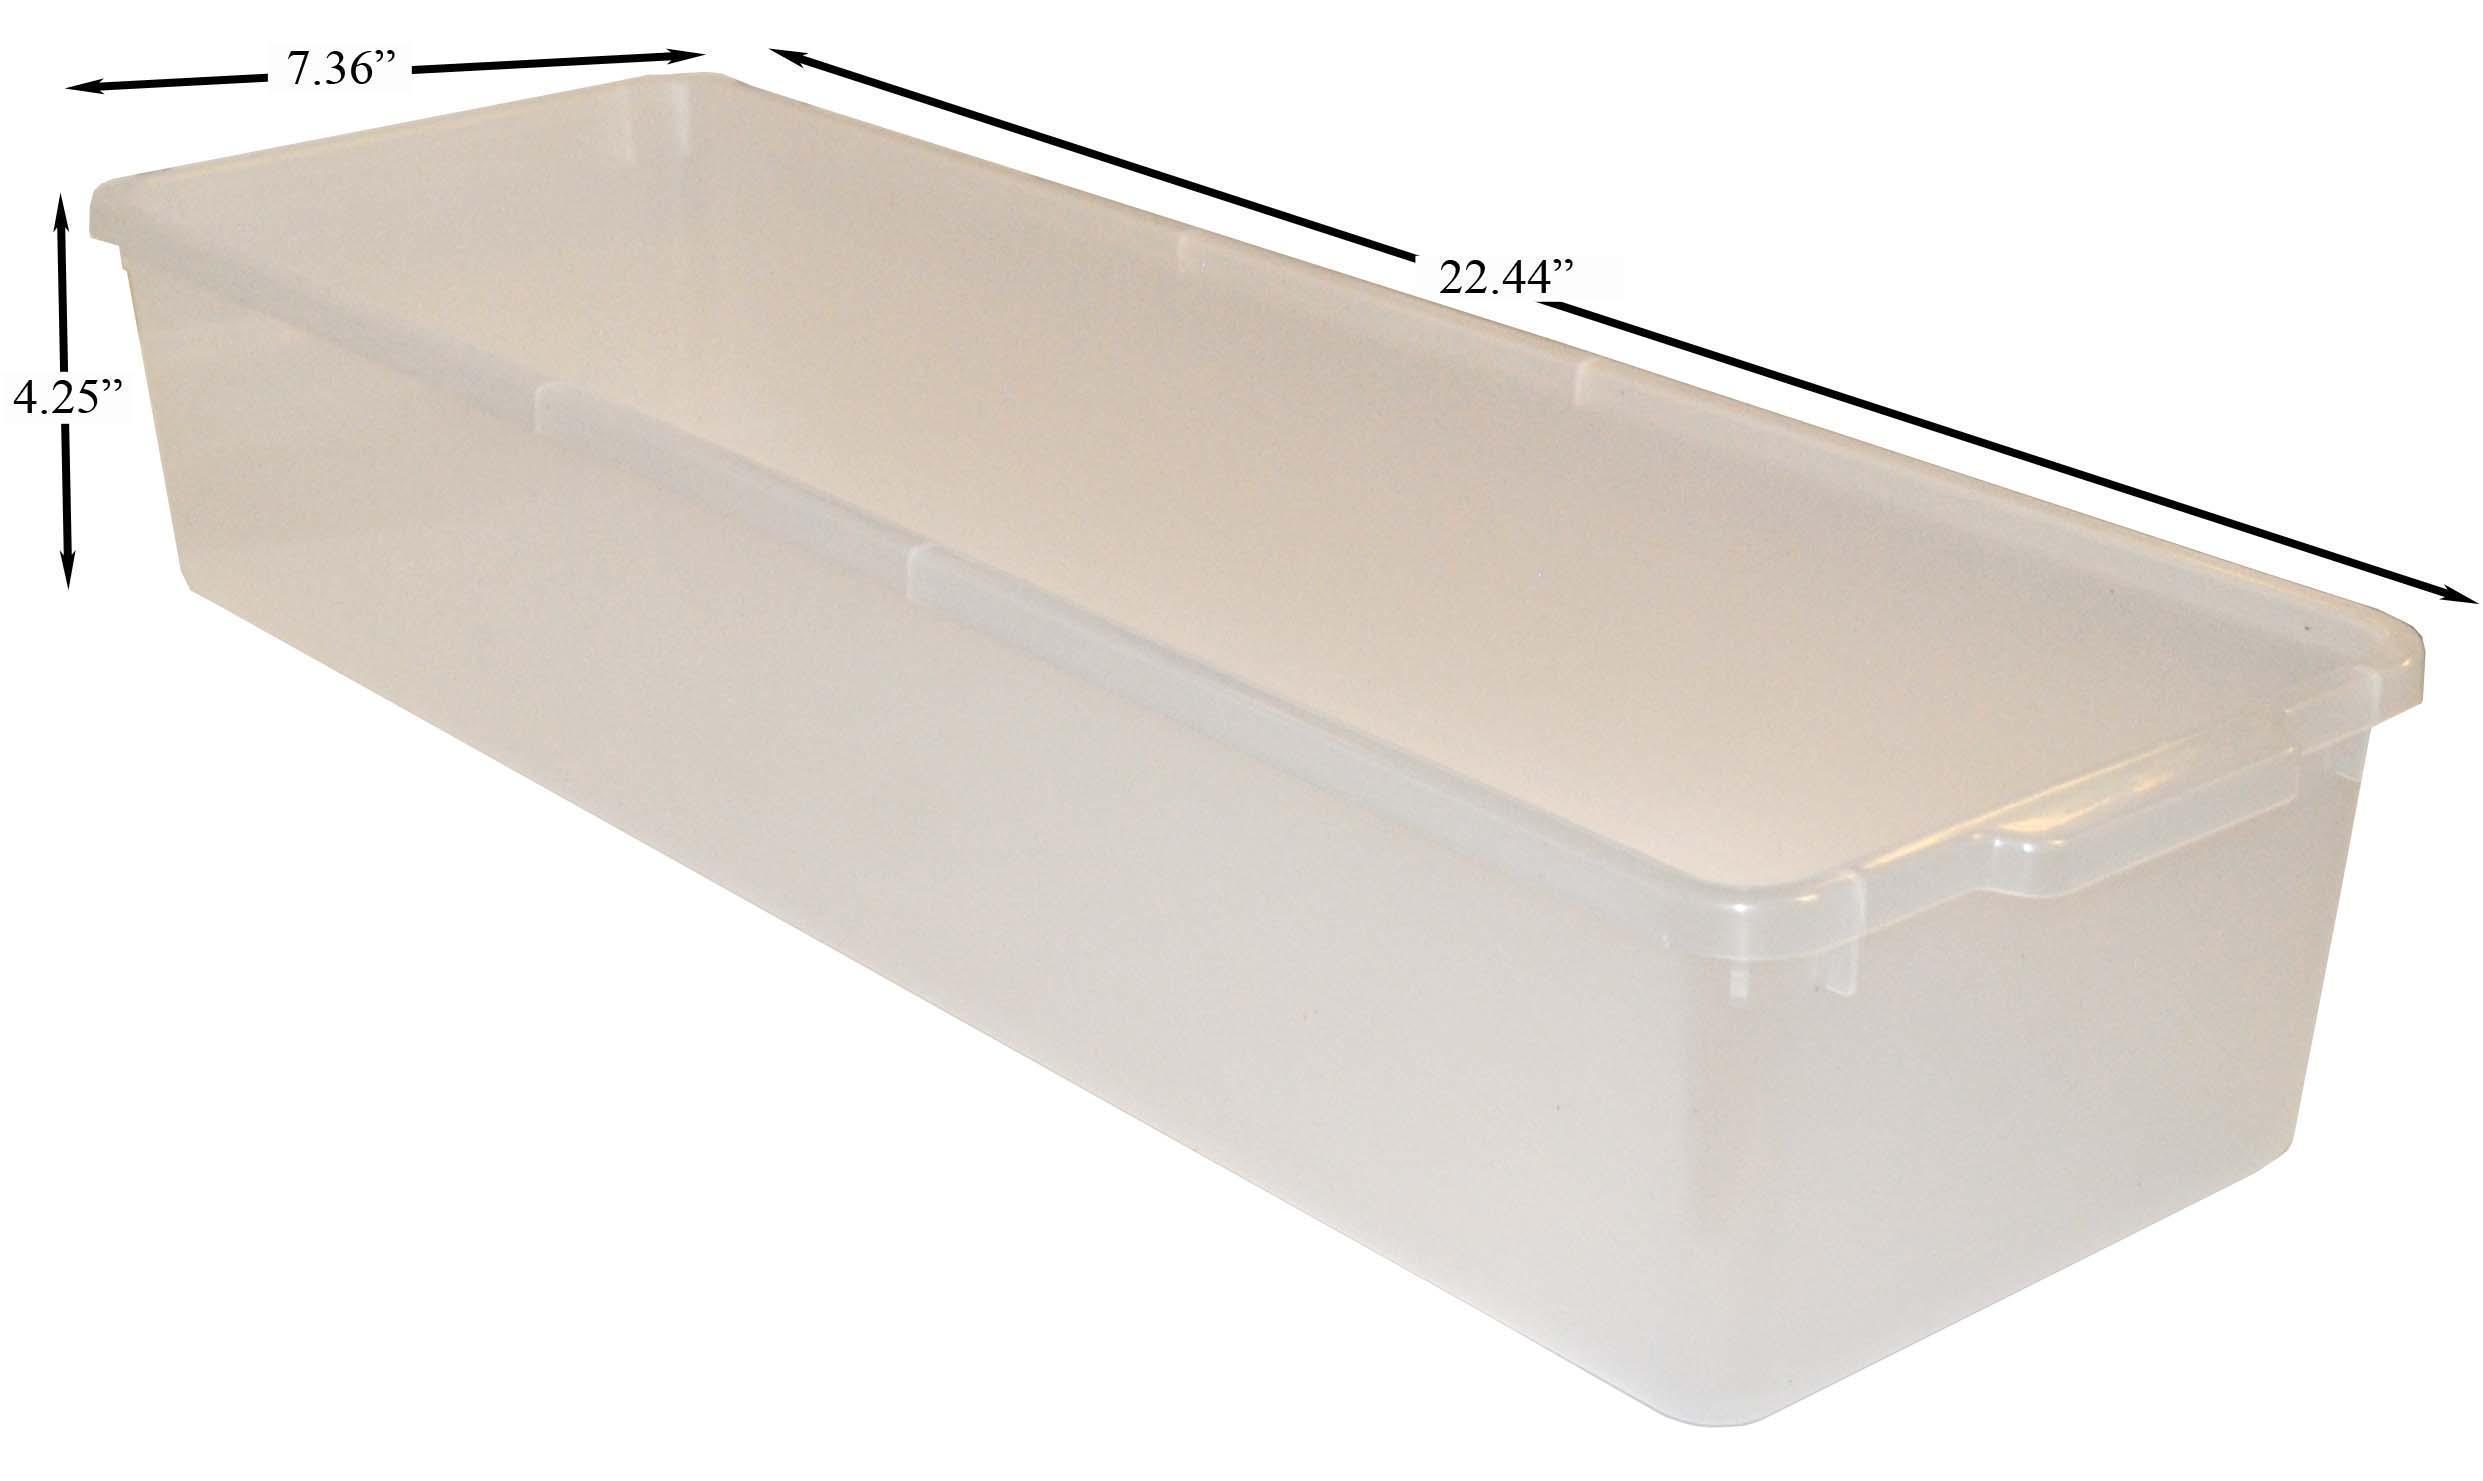 storage livery bucket set bin ddbc tack water amp scoop feed itm tub mucking